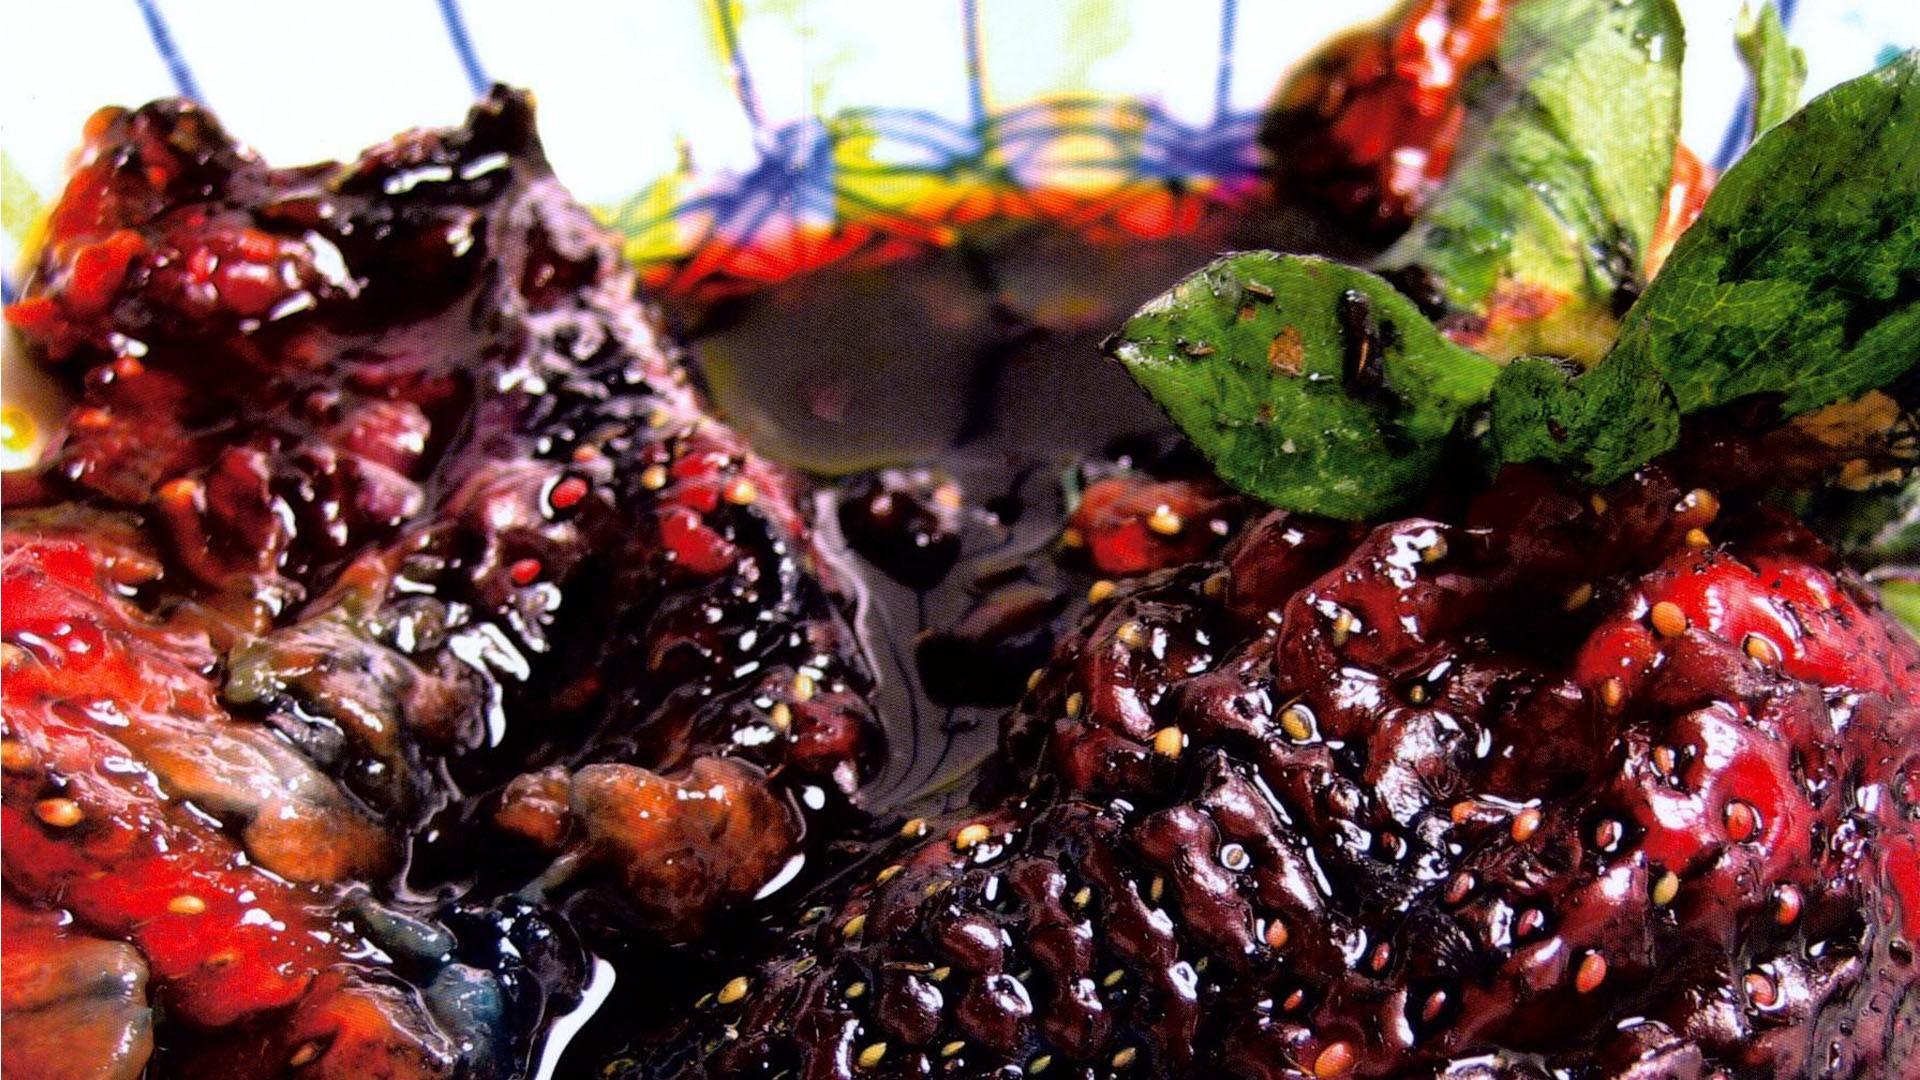 Top Wallpaper Music Food - food-music-fruit-album-covers-Animal-Collective-plant-berry-blackberry-cuisine-dish-produce-flowering-plant-vegetable-33577  Snapshot_151356.jpg